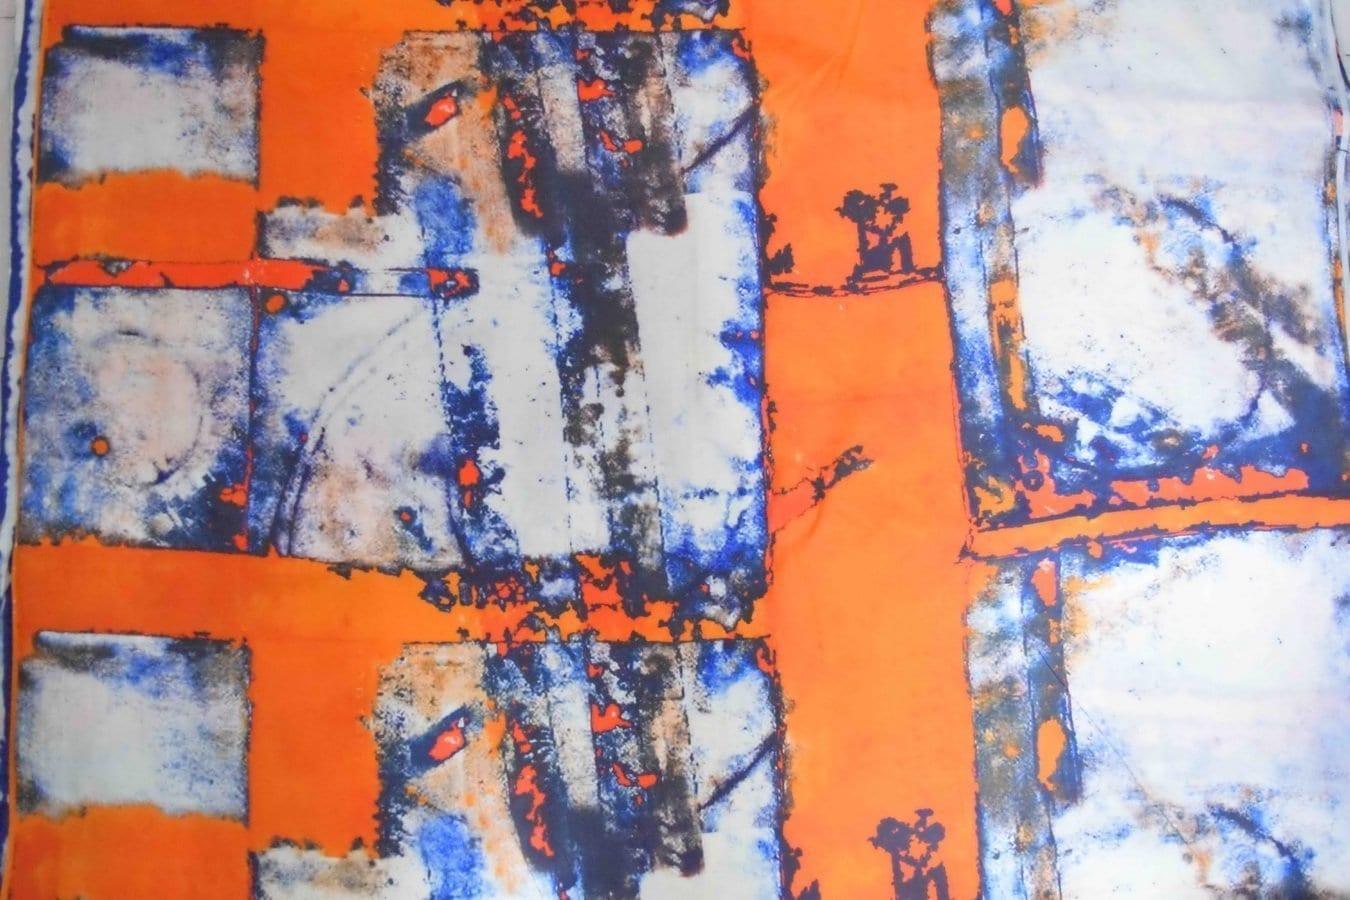 Orange COTTON PRINTED FABRIC for Multipurpose use PC362 1